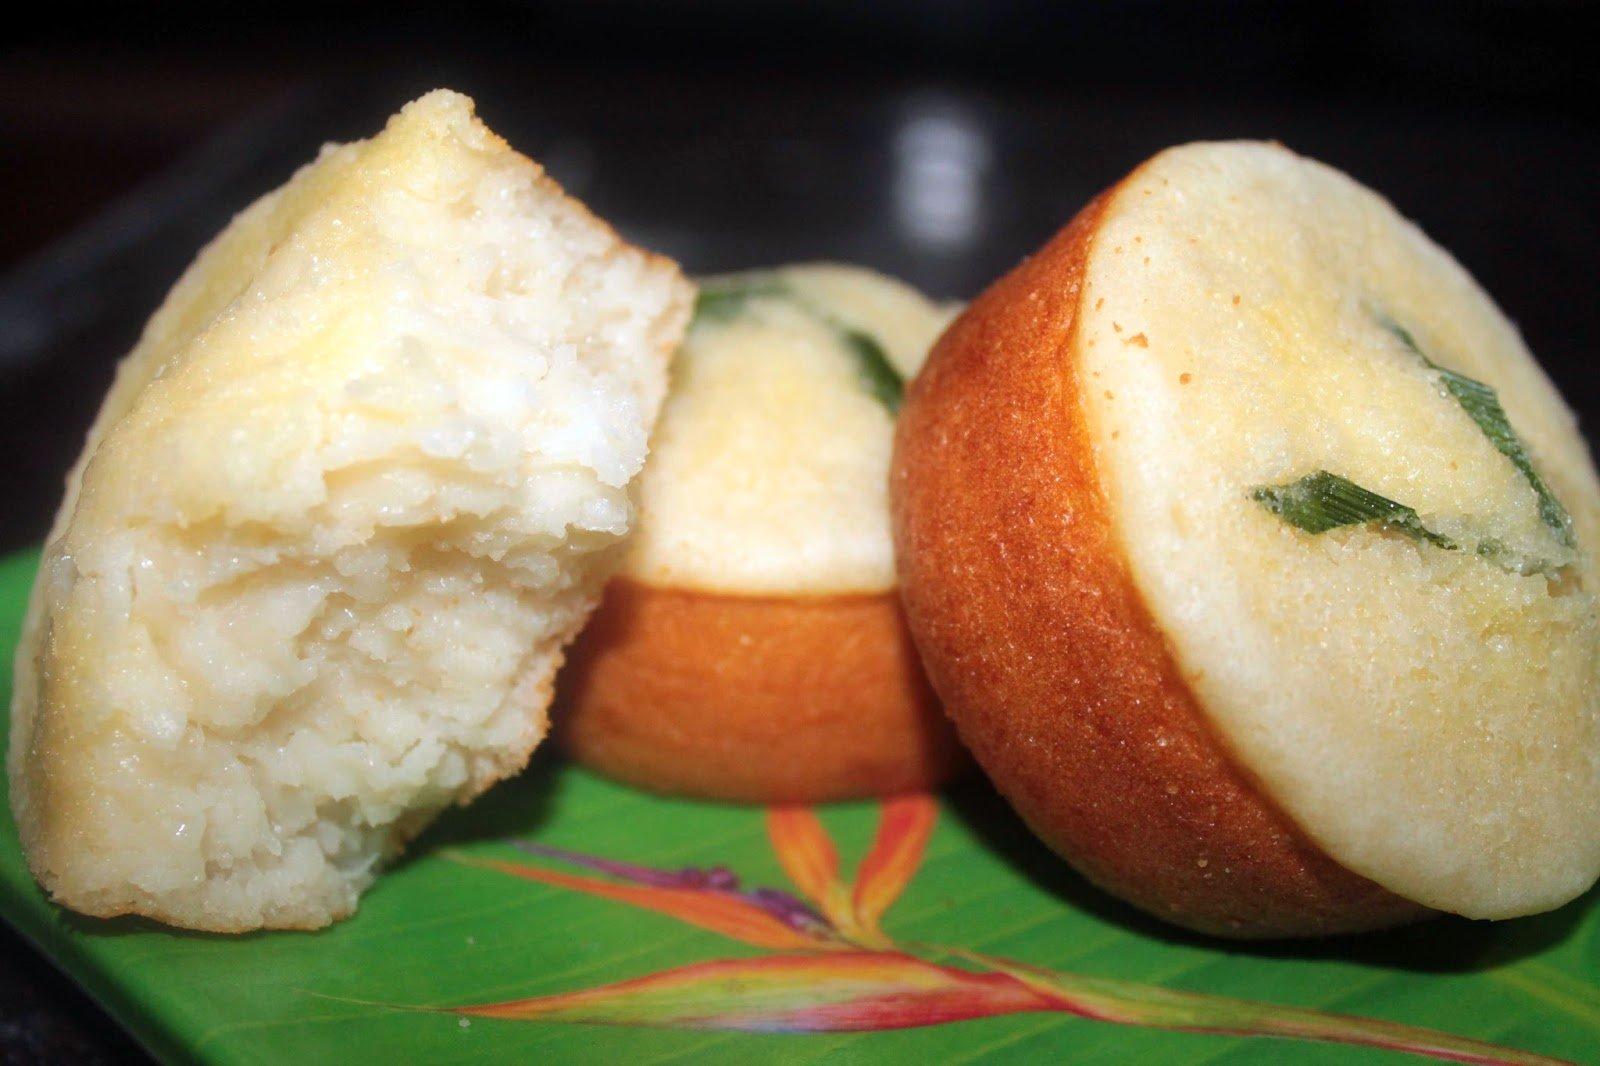 Langkah-langkah Cara Membuat Kue Apem Kukus Praktis Sederhana